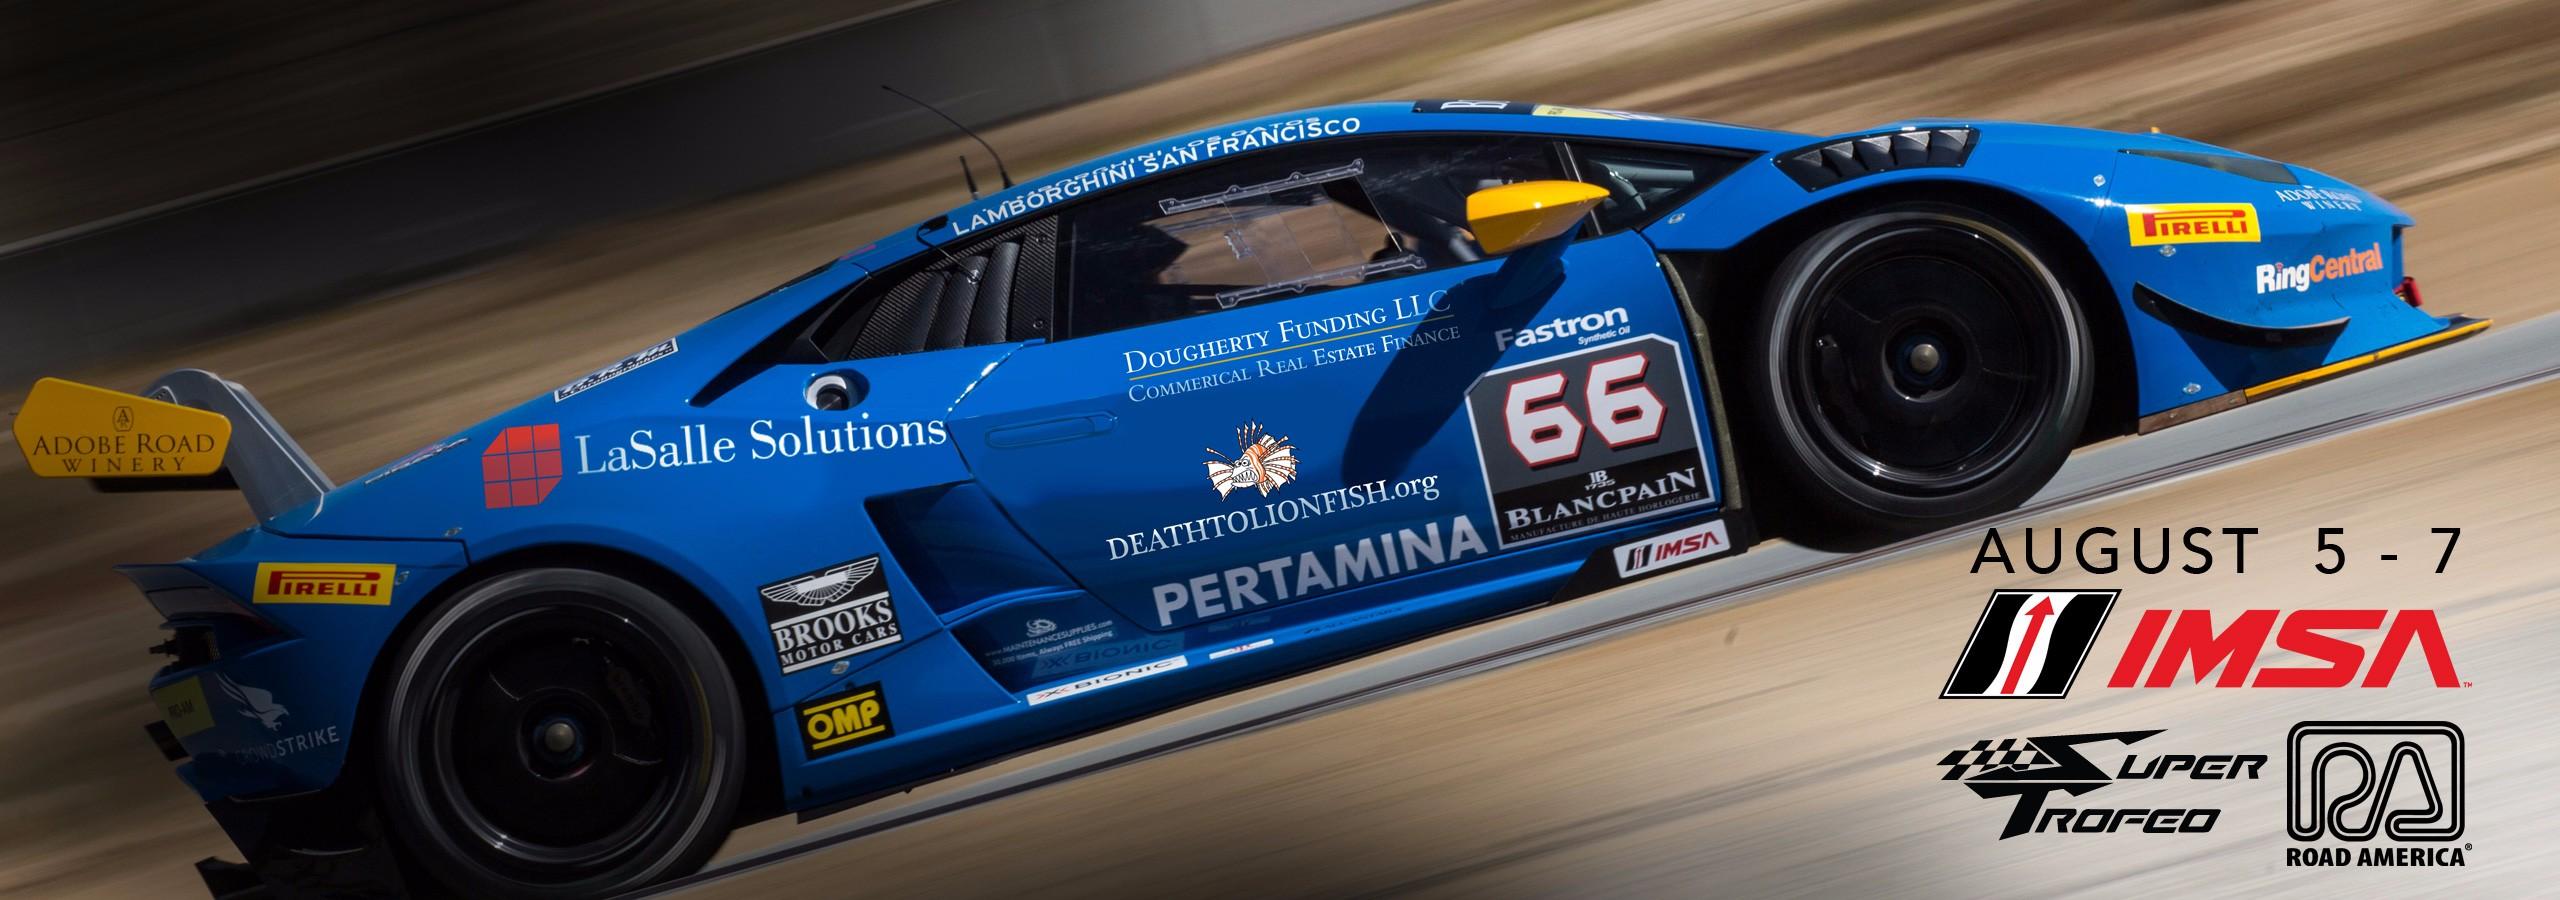 TRG Lamborghini Prepares for Double-Header Race Weekend at Road America